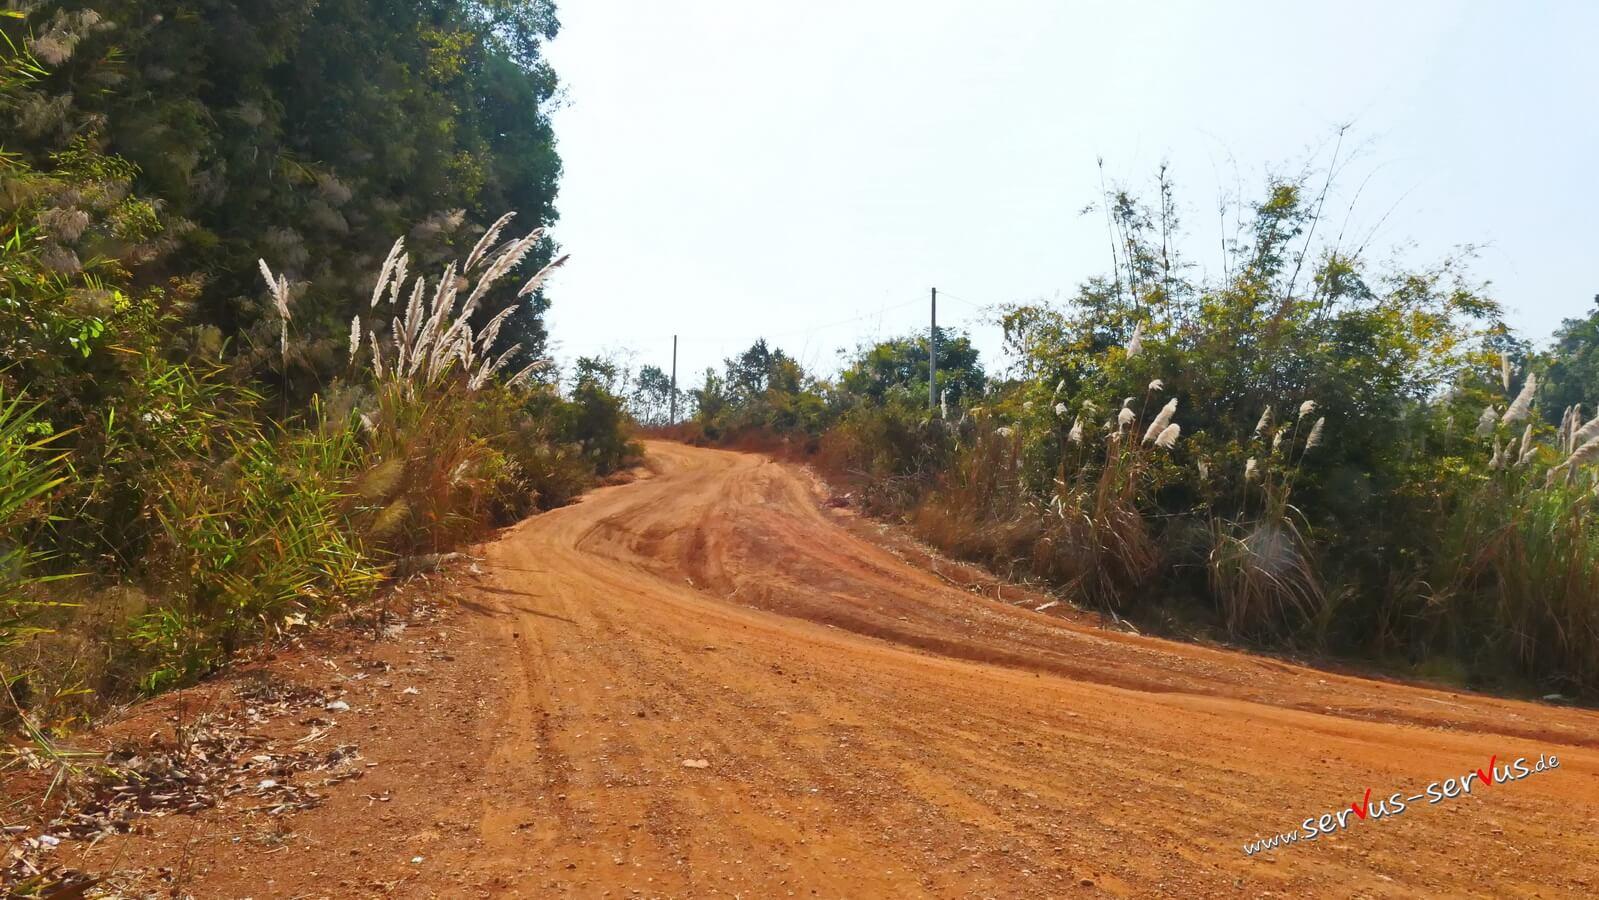 Dschungelweg, Laos, Bolavenplateau, Tad Tayicseua